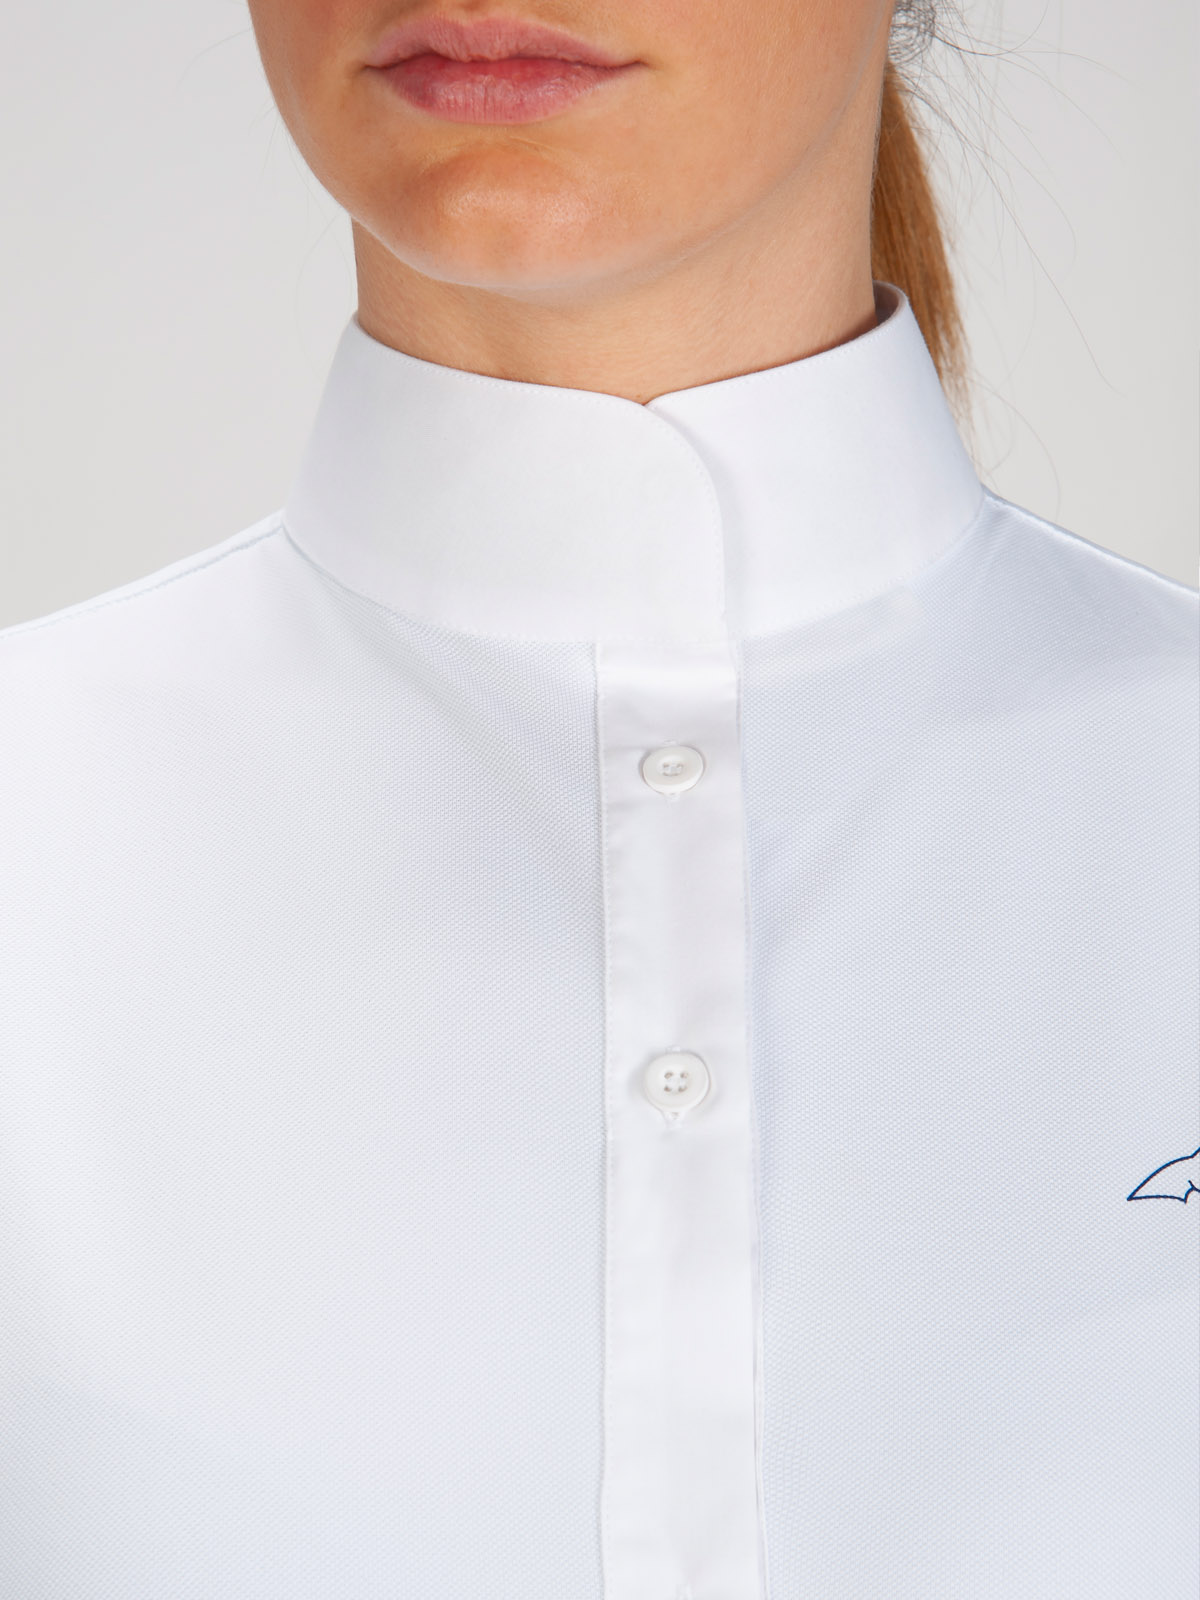 VICTORIA - Women's Long Sleeve Show Shirt 3